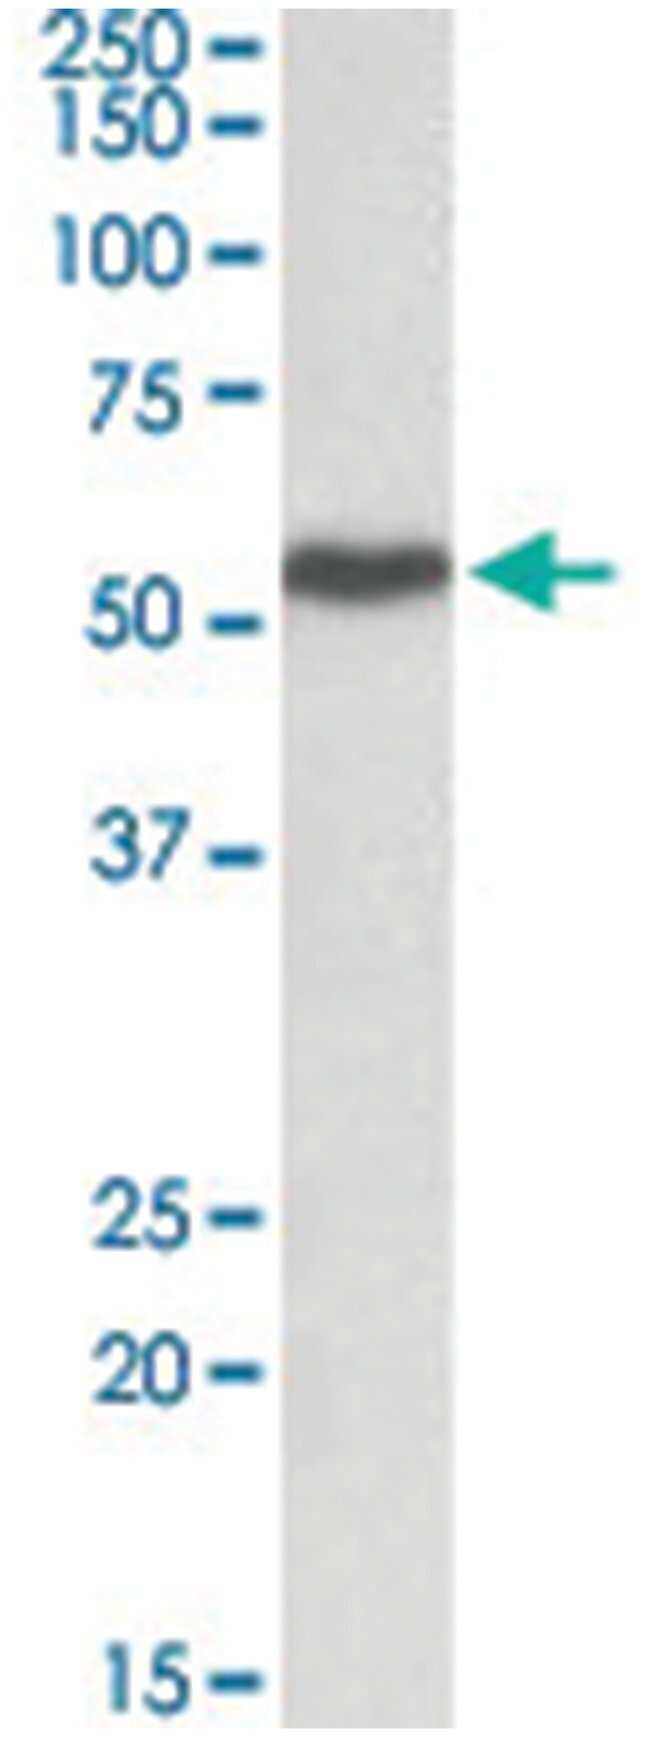 LSP1 Goat anti-Human, Polyclonal Antibody, Abnova 100µg; Unlabeled:Life